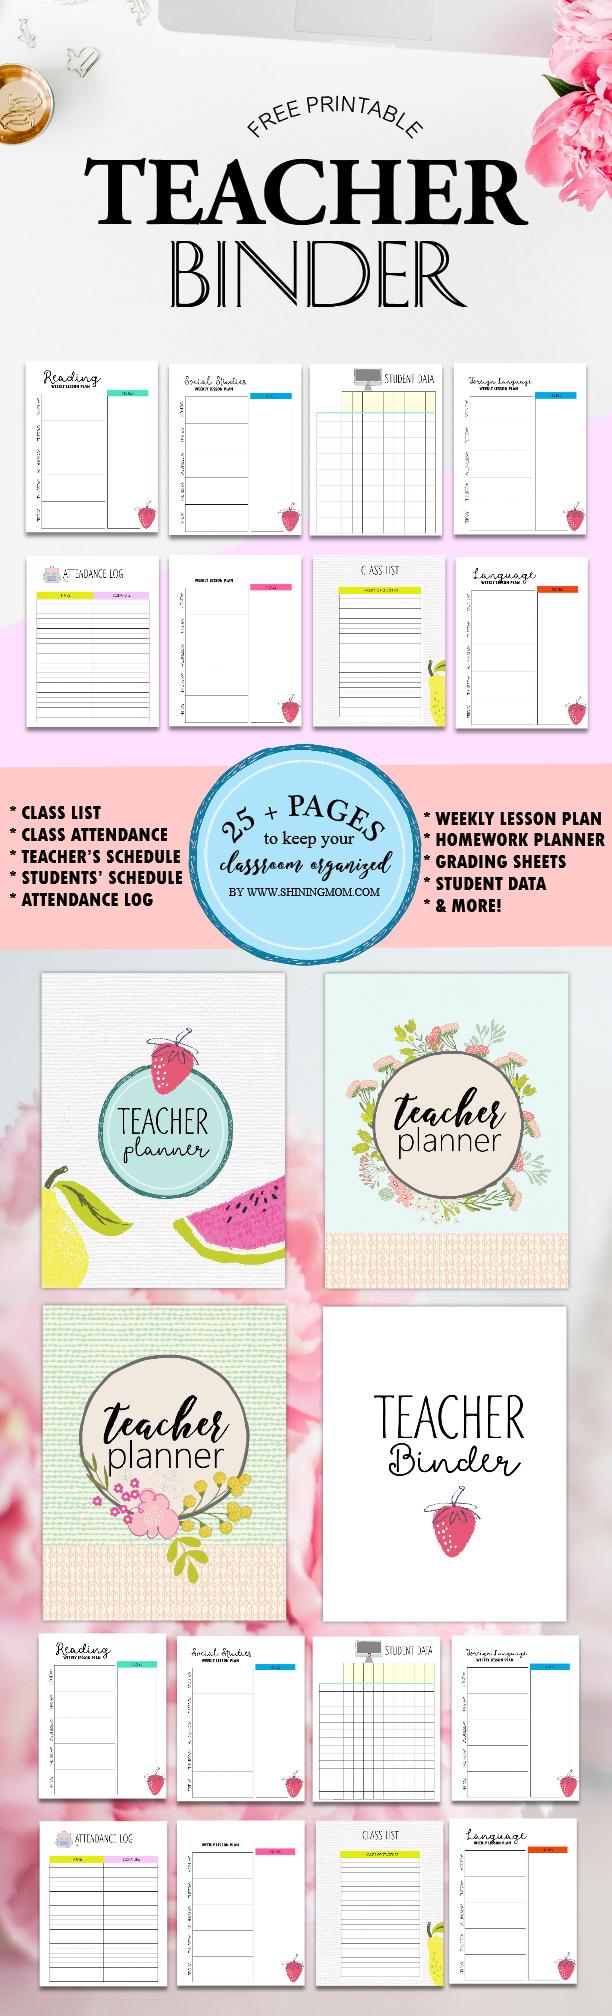 Free Teacher Binder Printables: Over 25 Pretty Planning Templates! - Free Printable Teacher Planner Pages